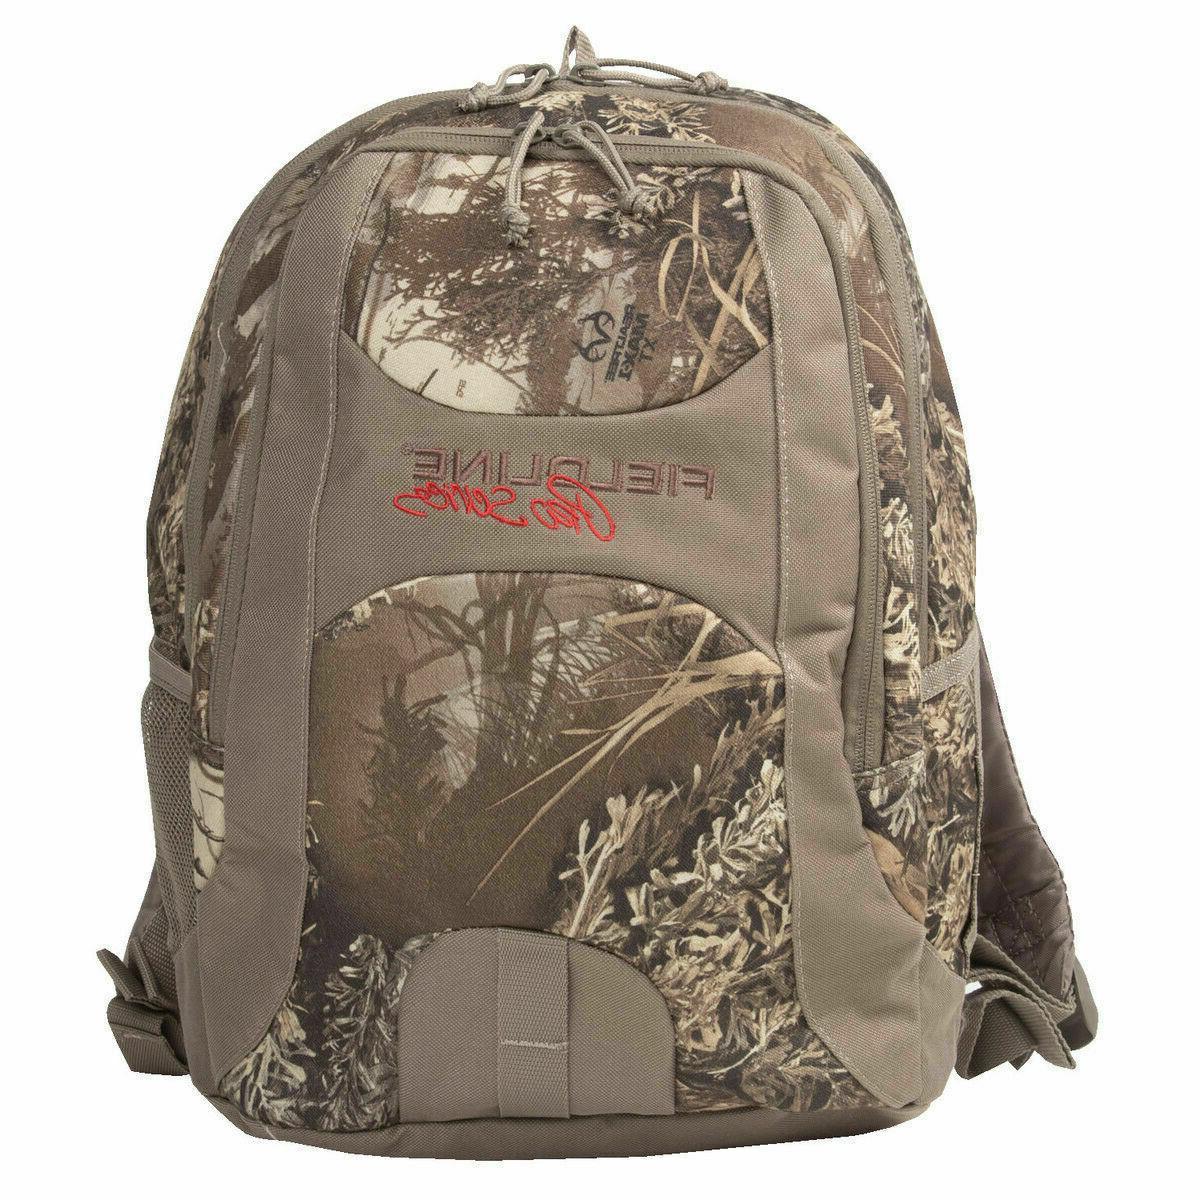 Fieldline Pro Series 28.5 Liter Backpack Camo